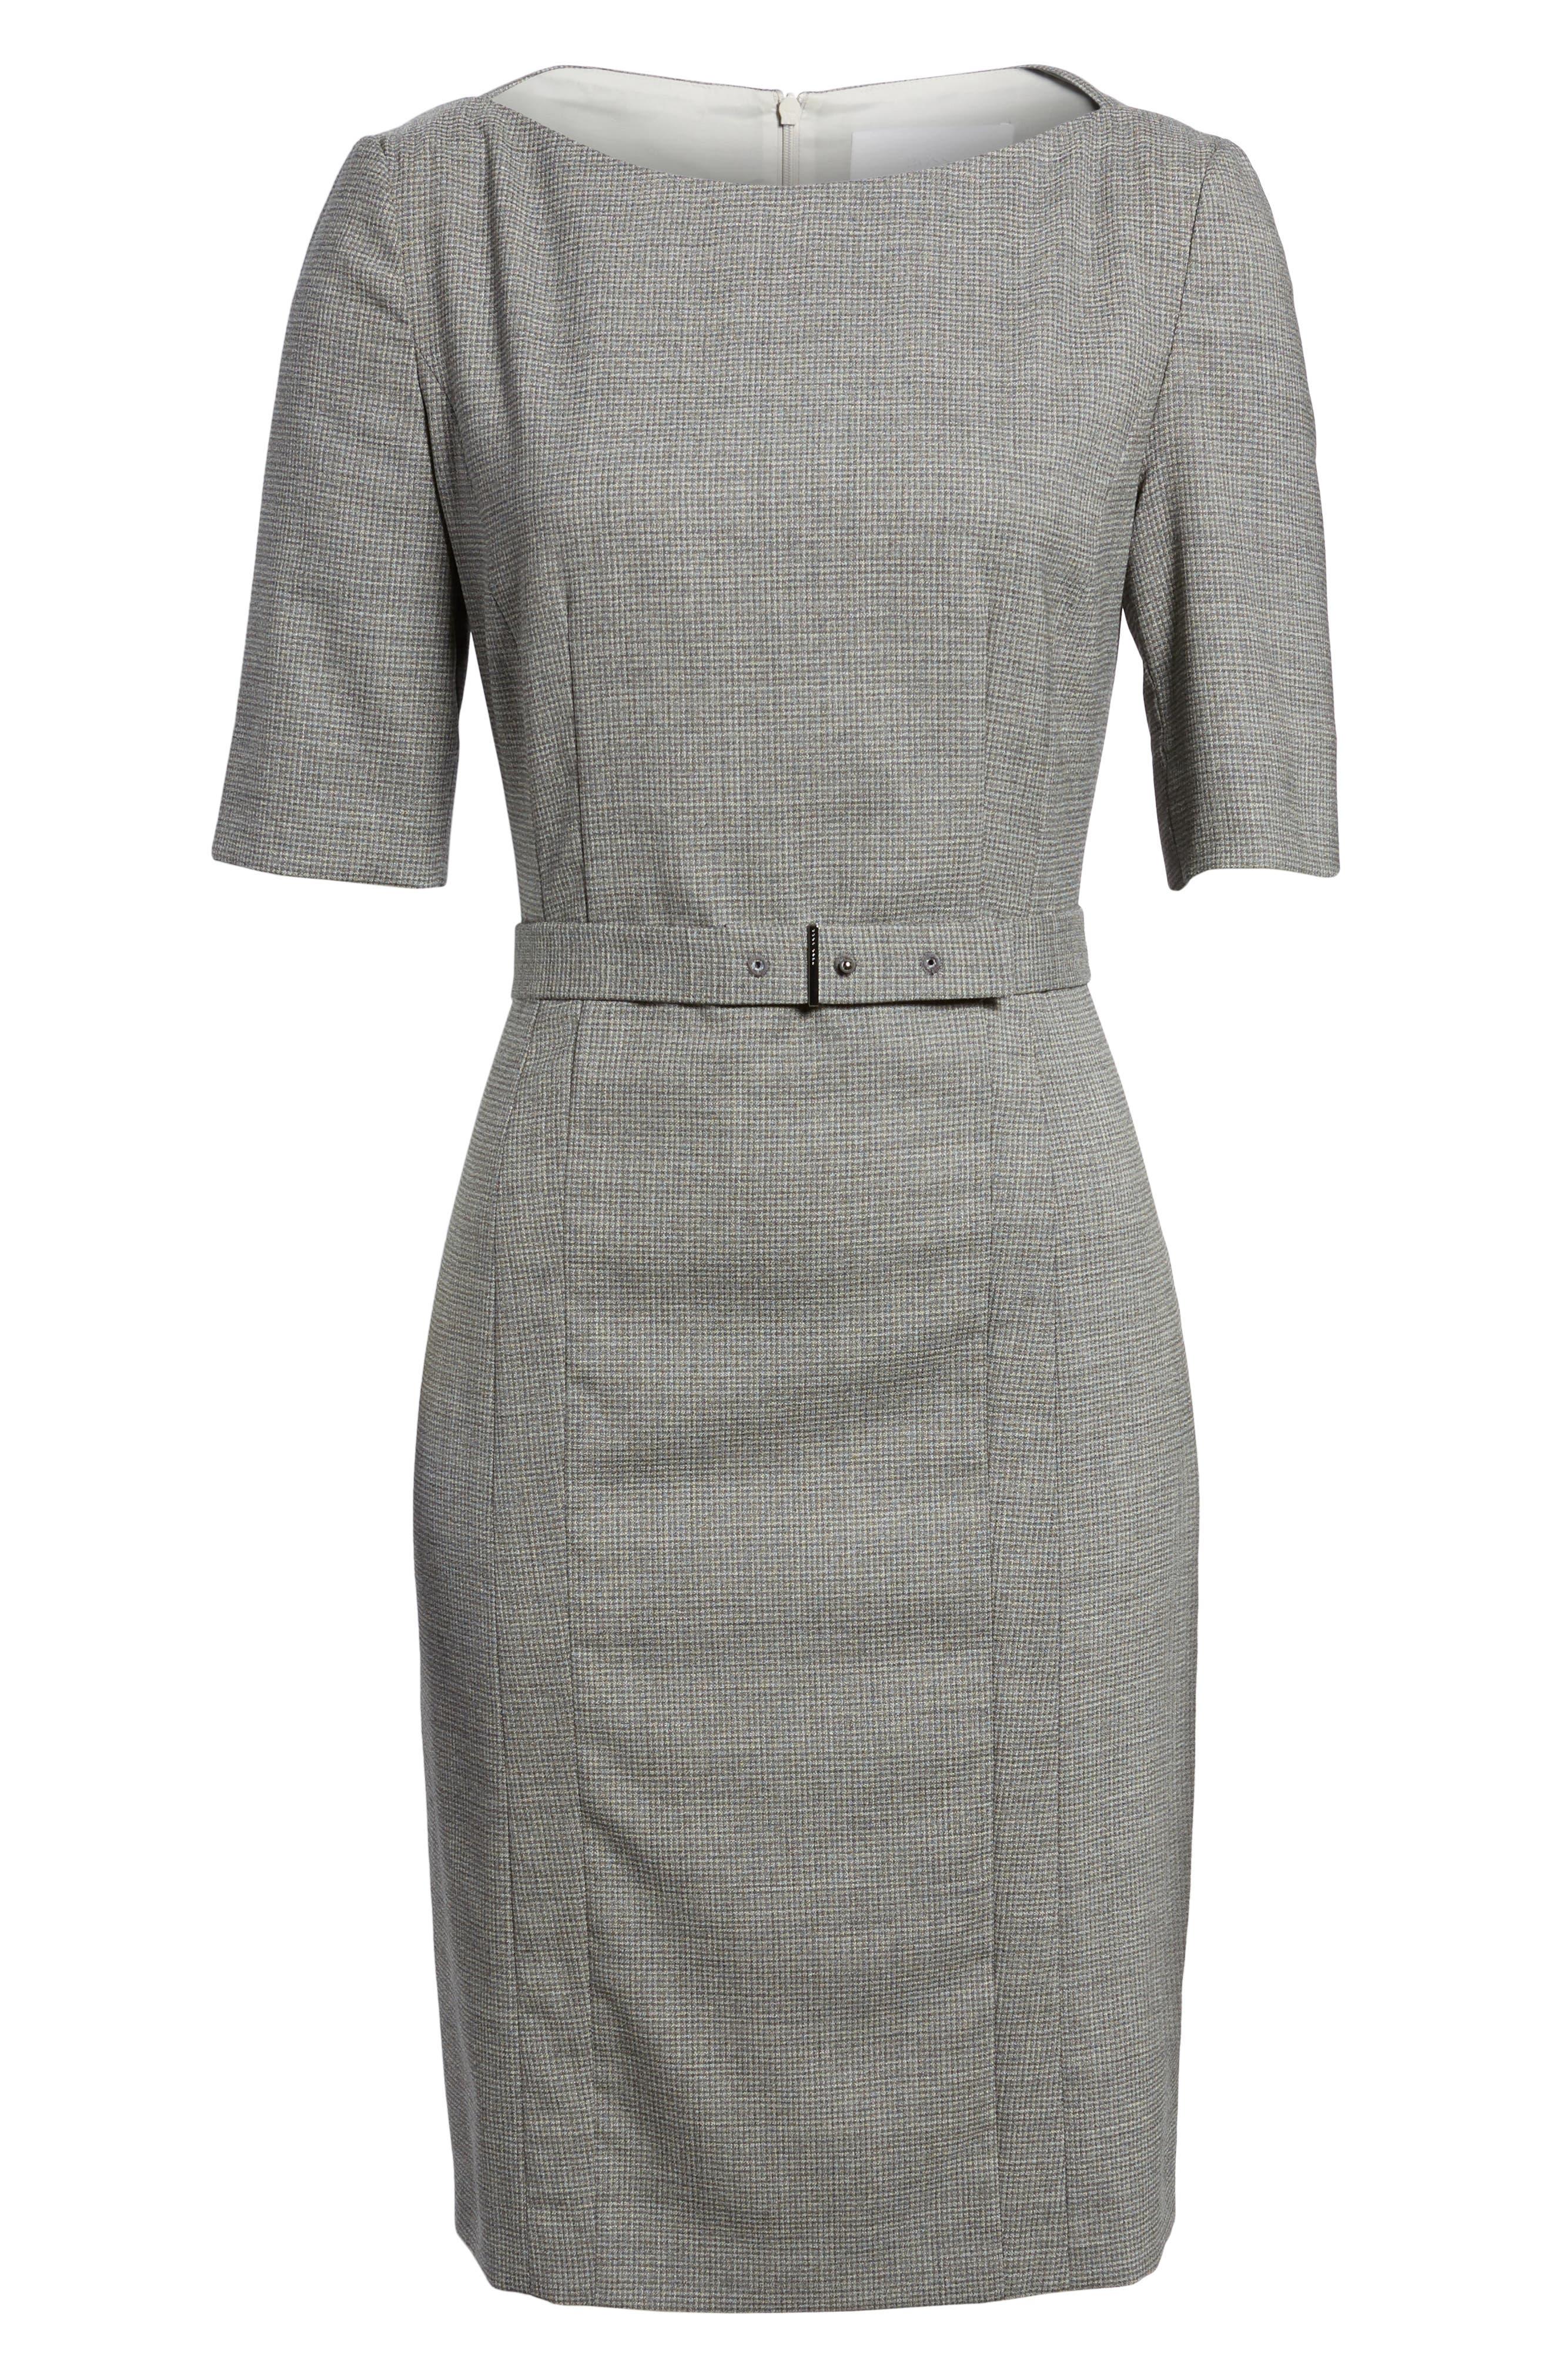 Dewisa Check Wool Sheath Dress,                             Alternate thumbnail 6, color,